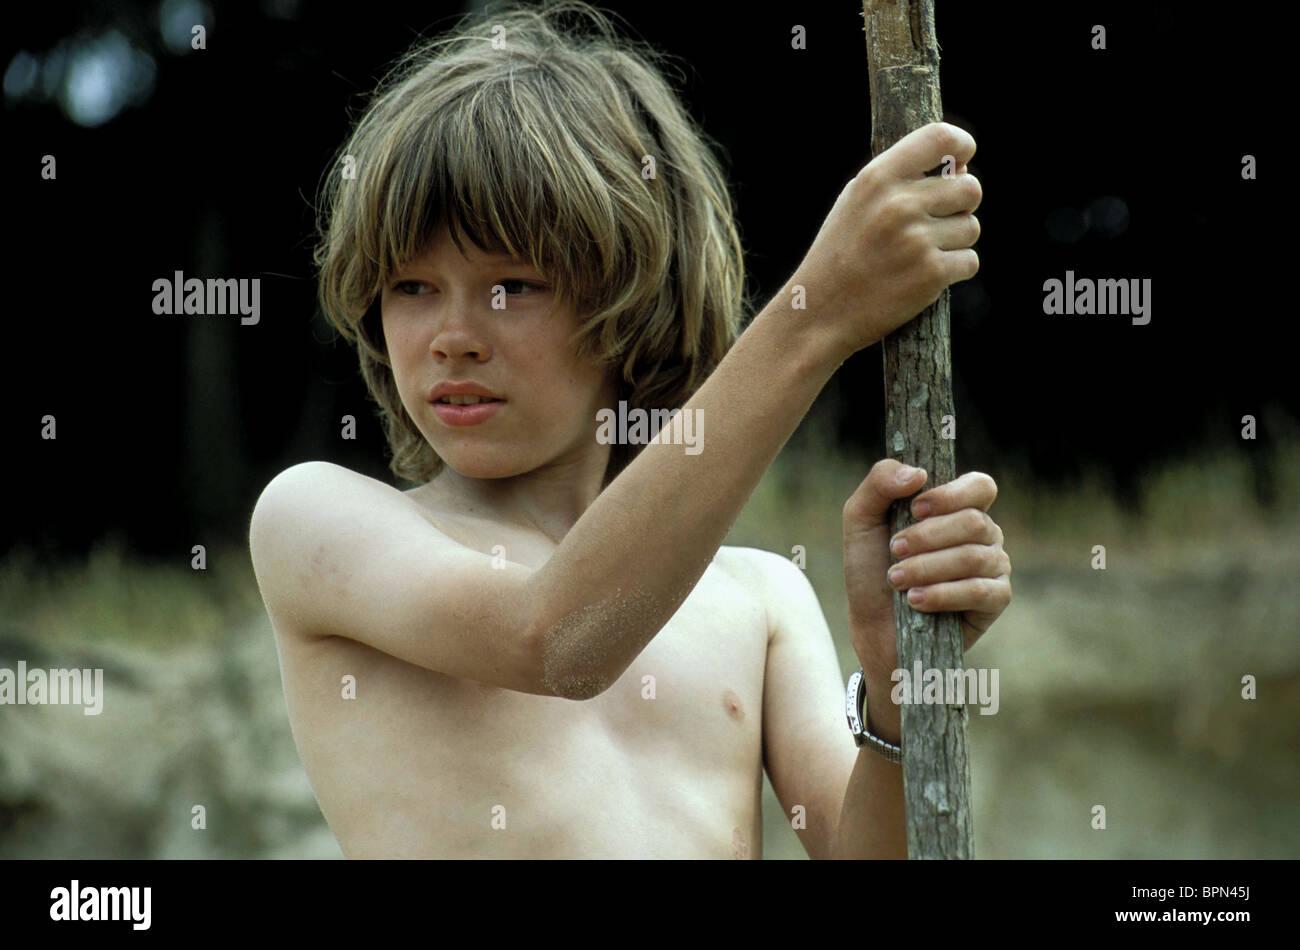 DEVON ALAN UNDERTOW (2004) - Stock Image